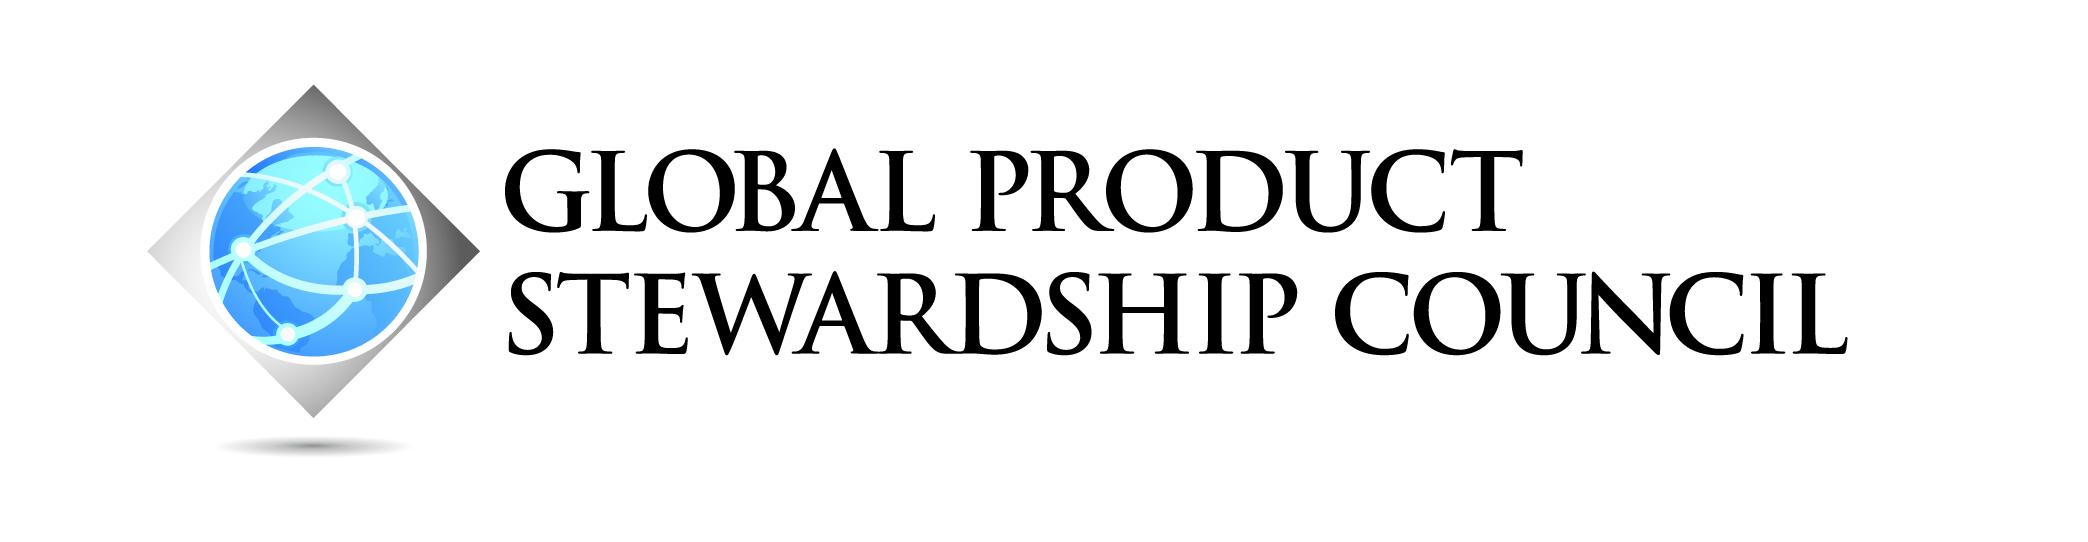 Benefits of GlobalPSC Membership